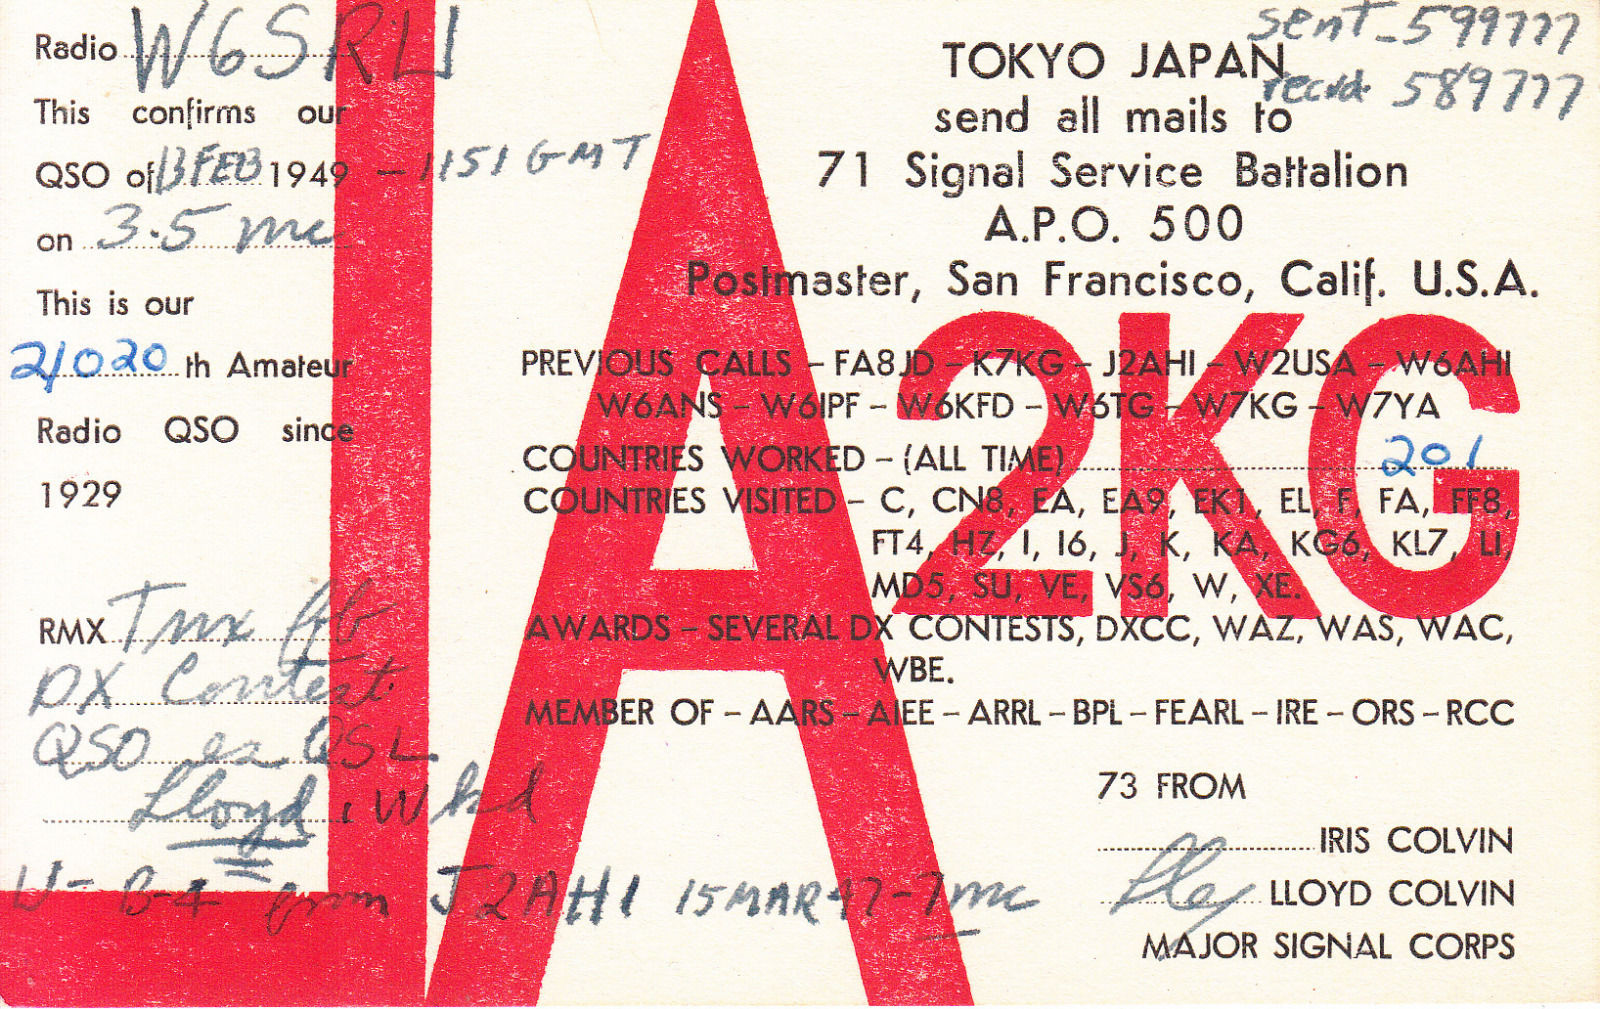 Нажмите на изображение для увеличения.  Название:9) ja2kg lloyd colvin 1947.jpg Просмотров:43 Размер:470.6 Кб ID:169984